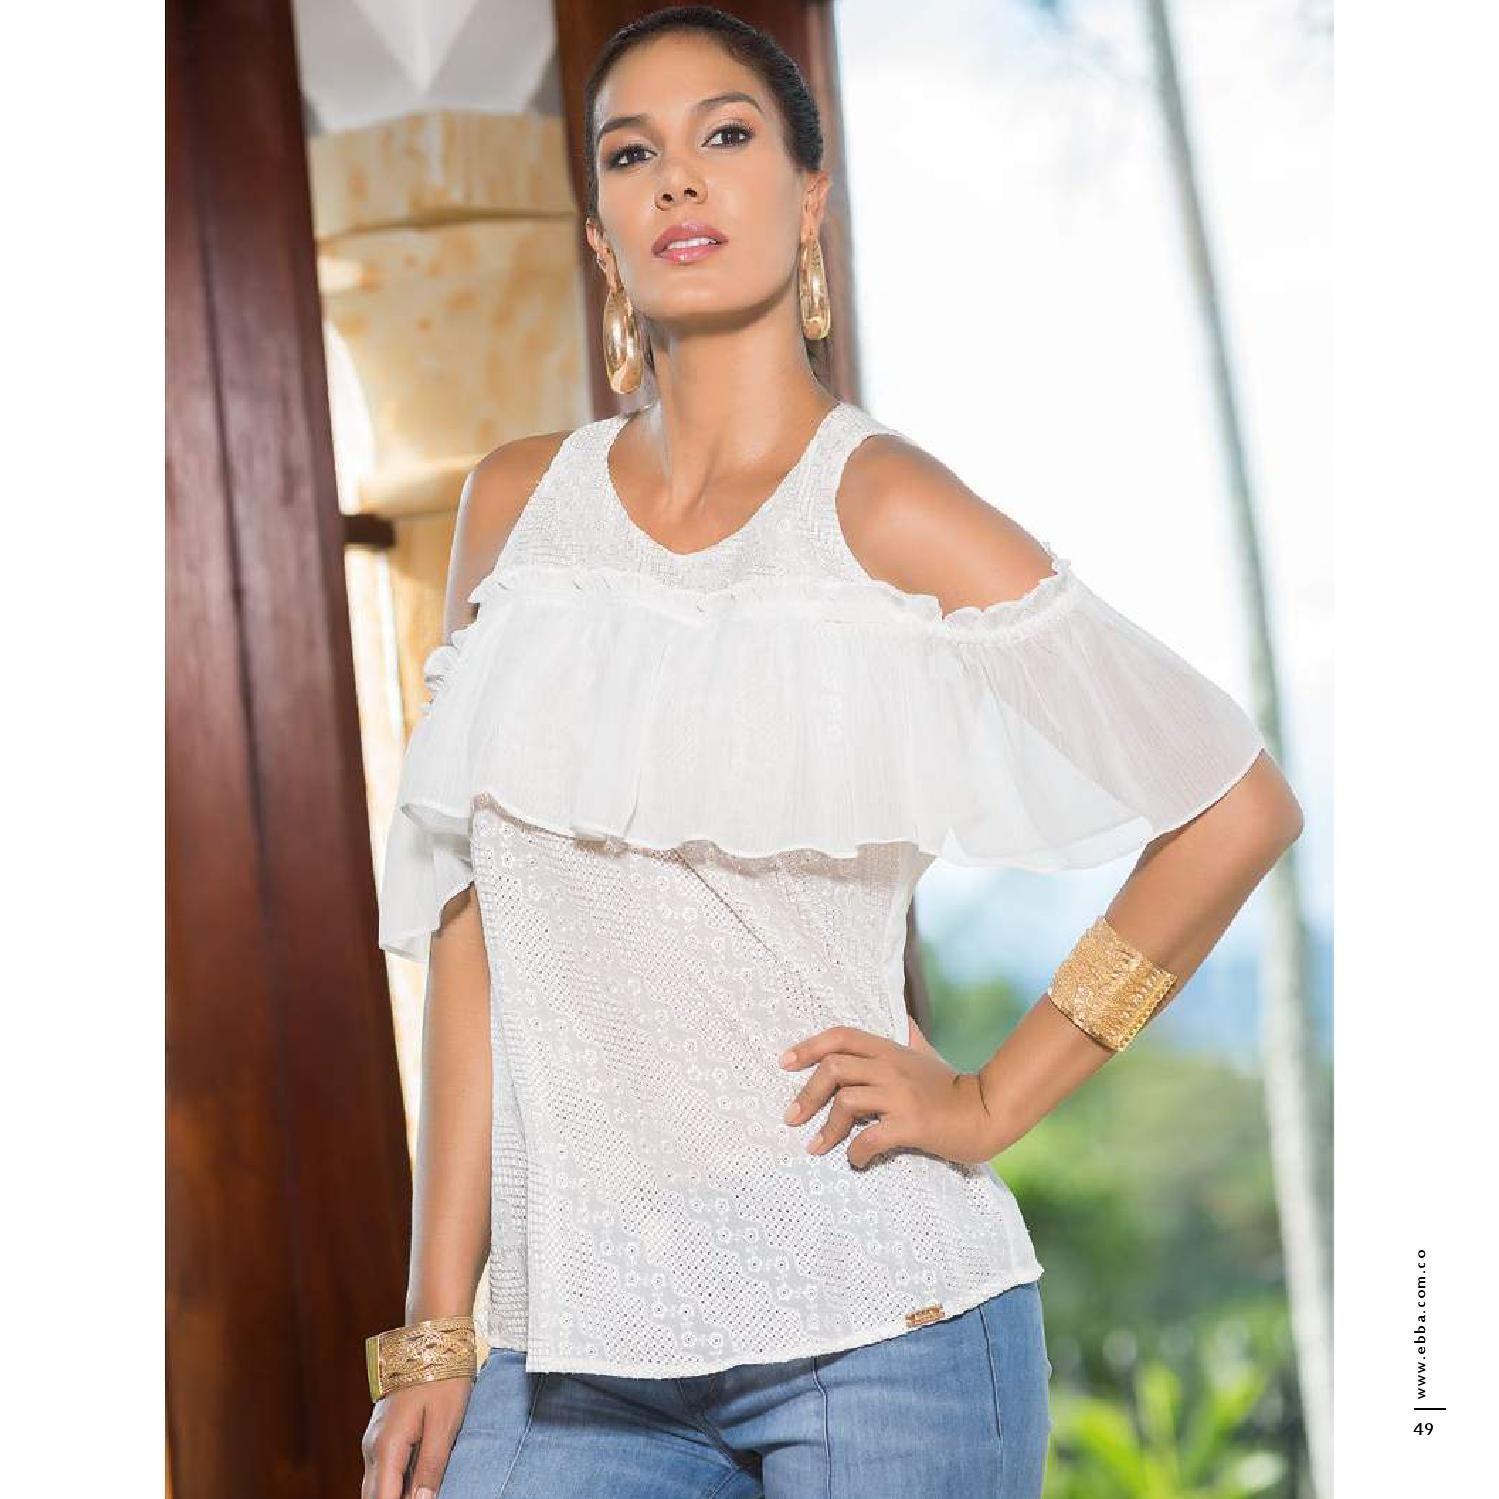 Andrea A Pacheco